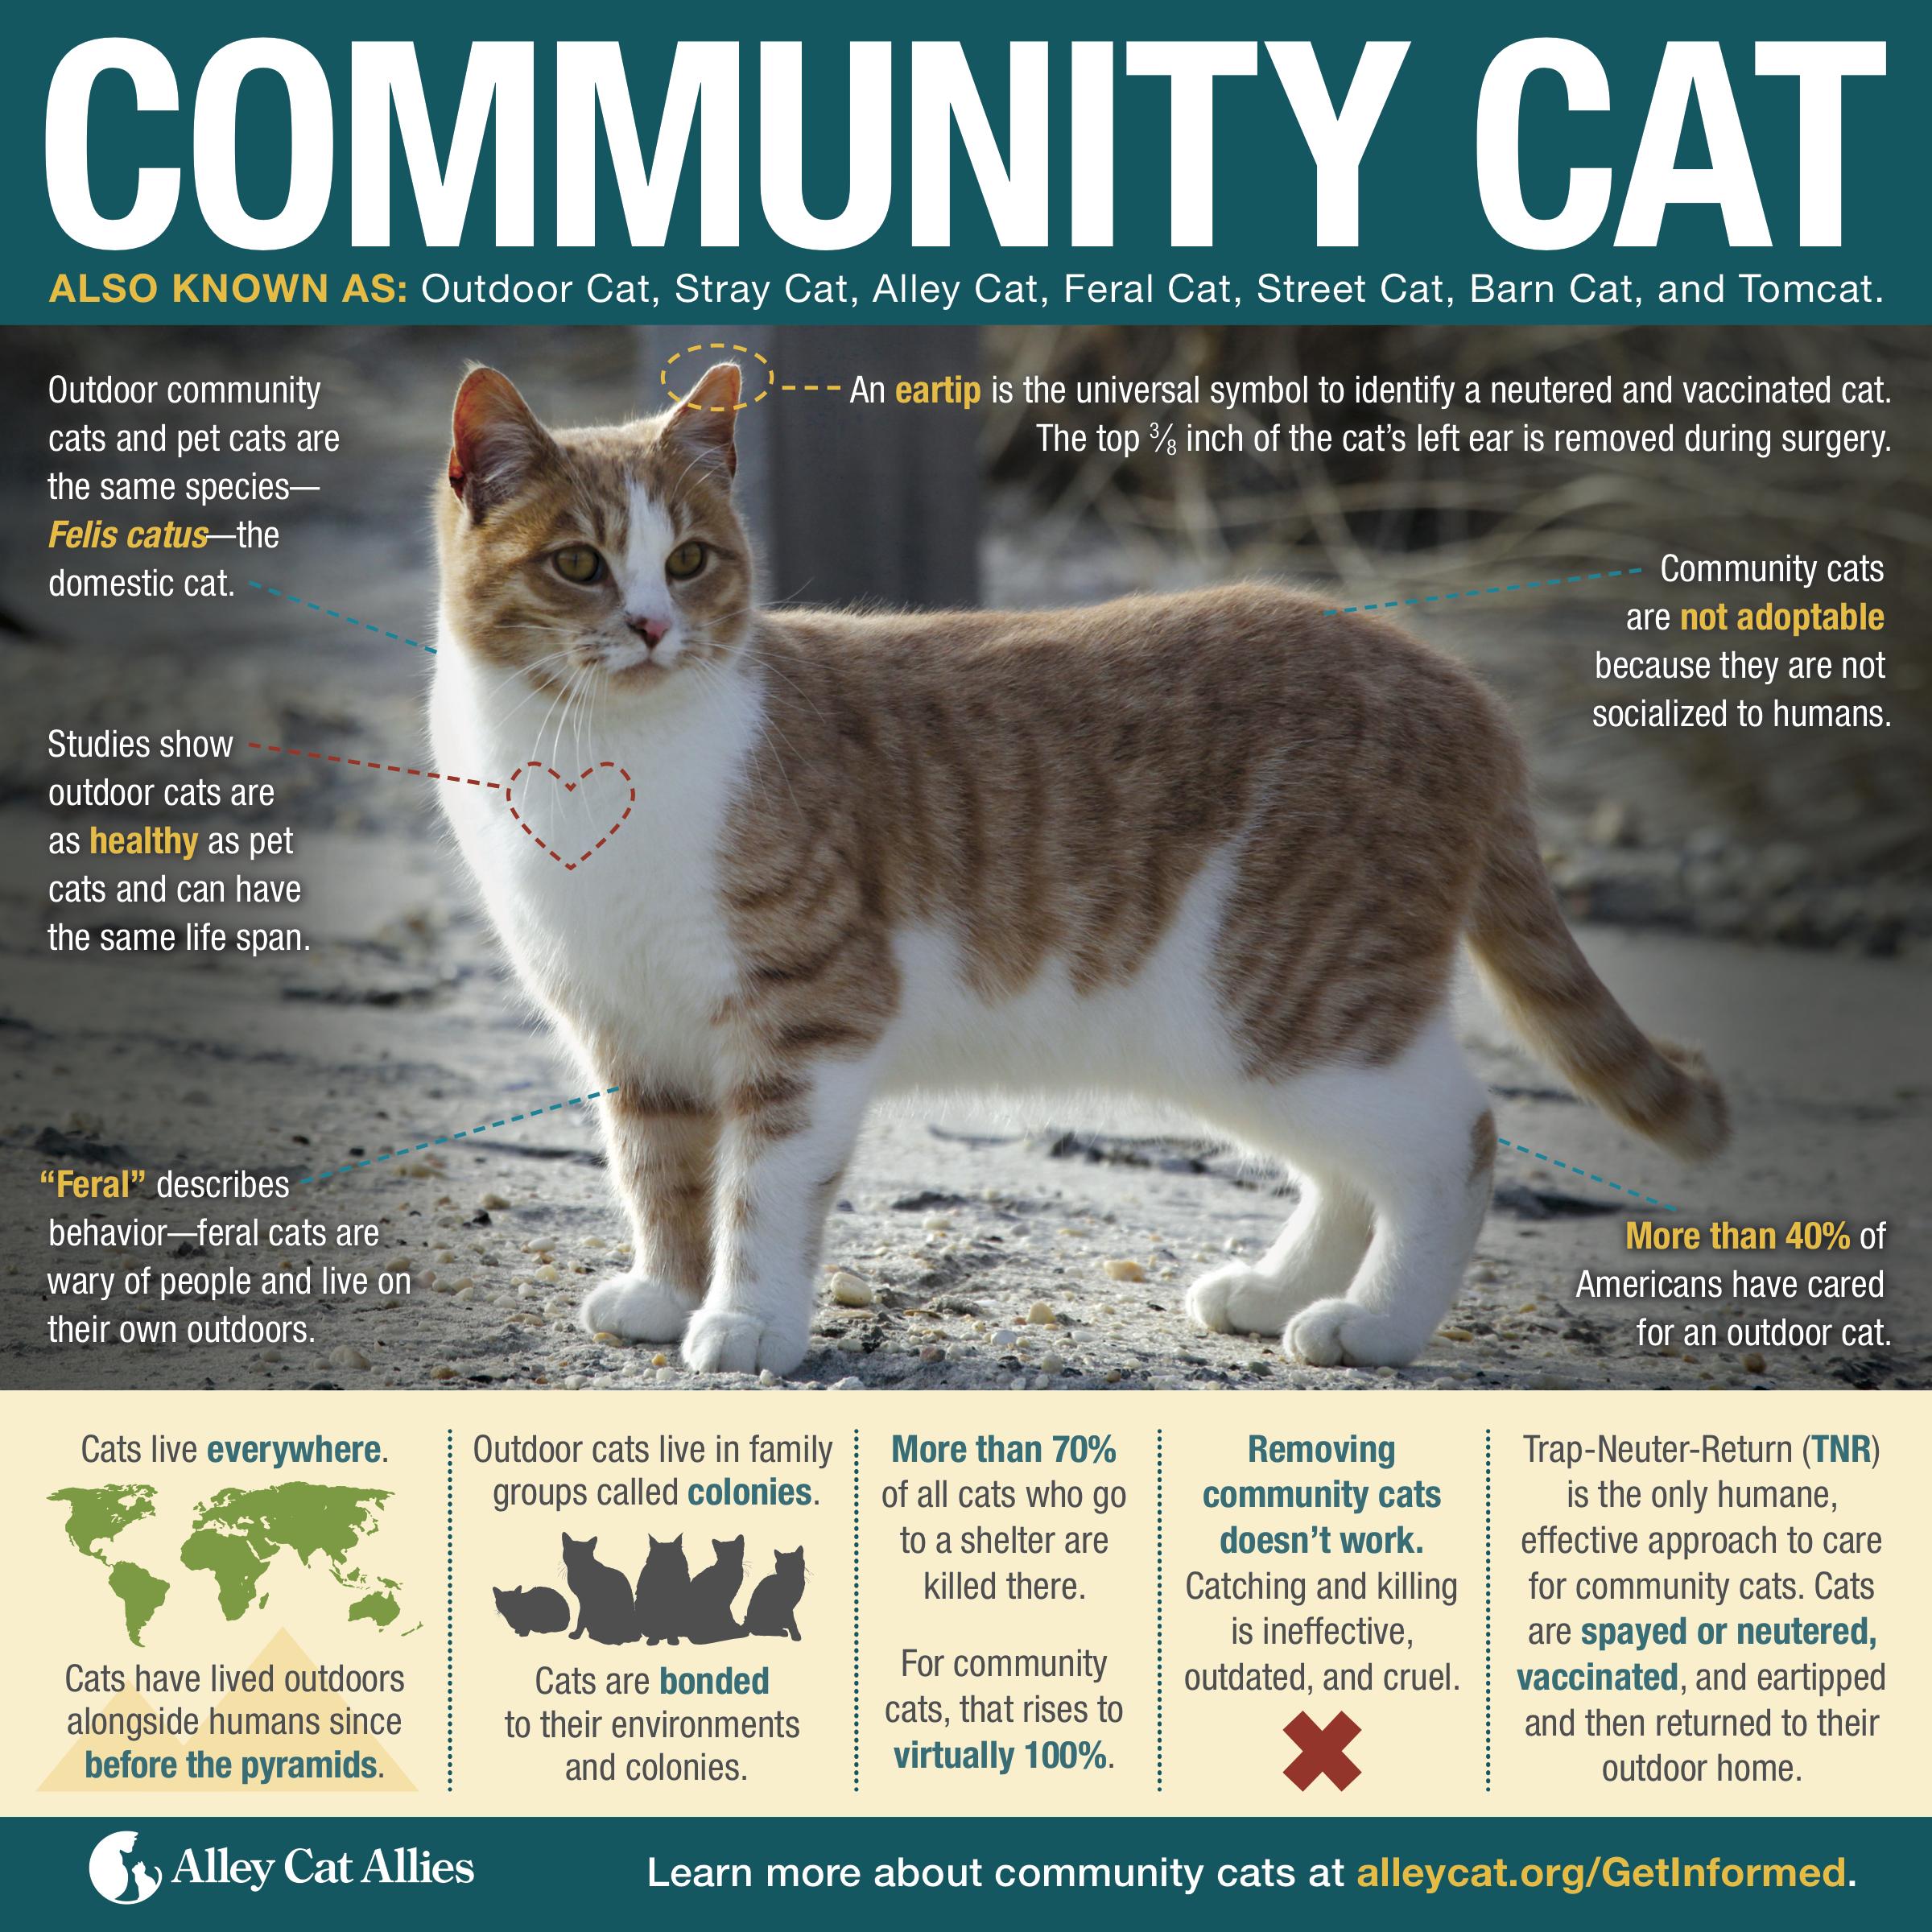 mating season for cats